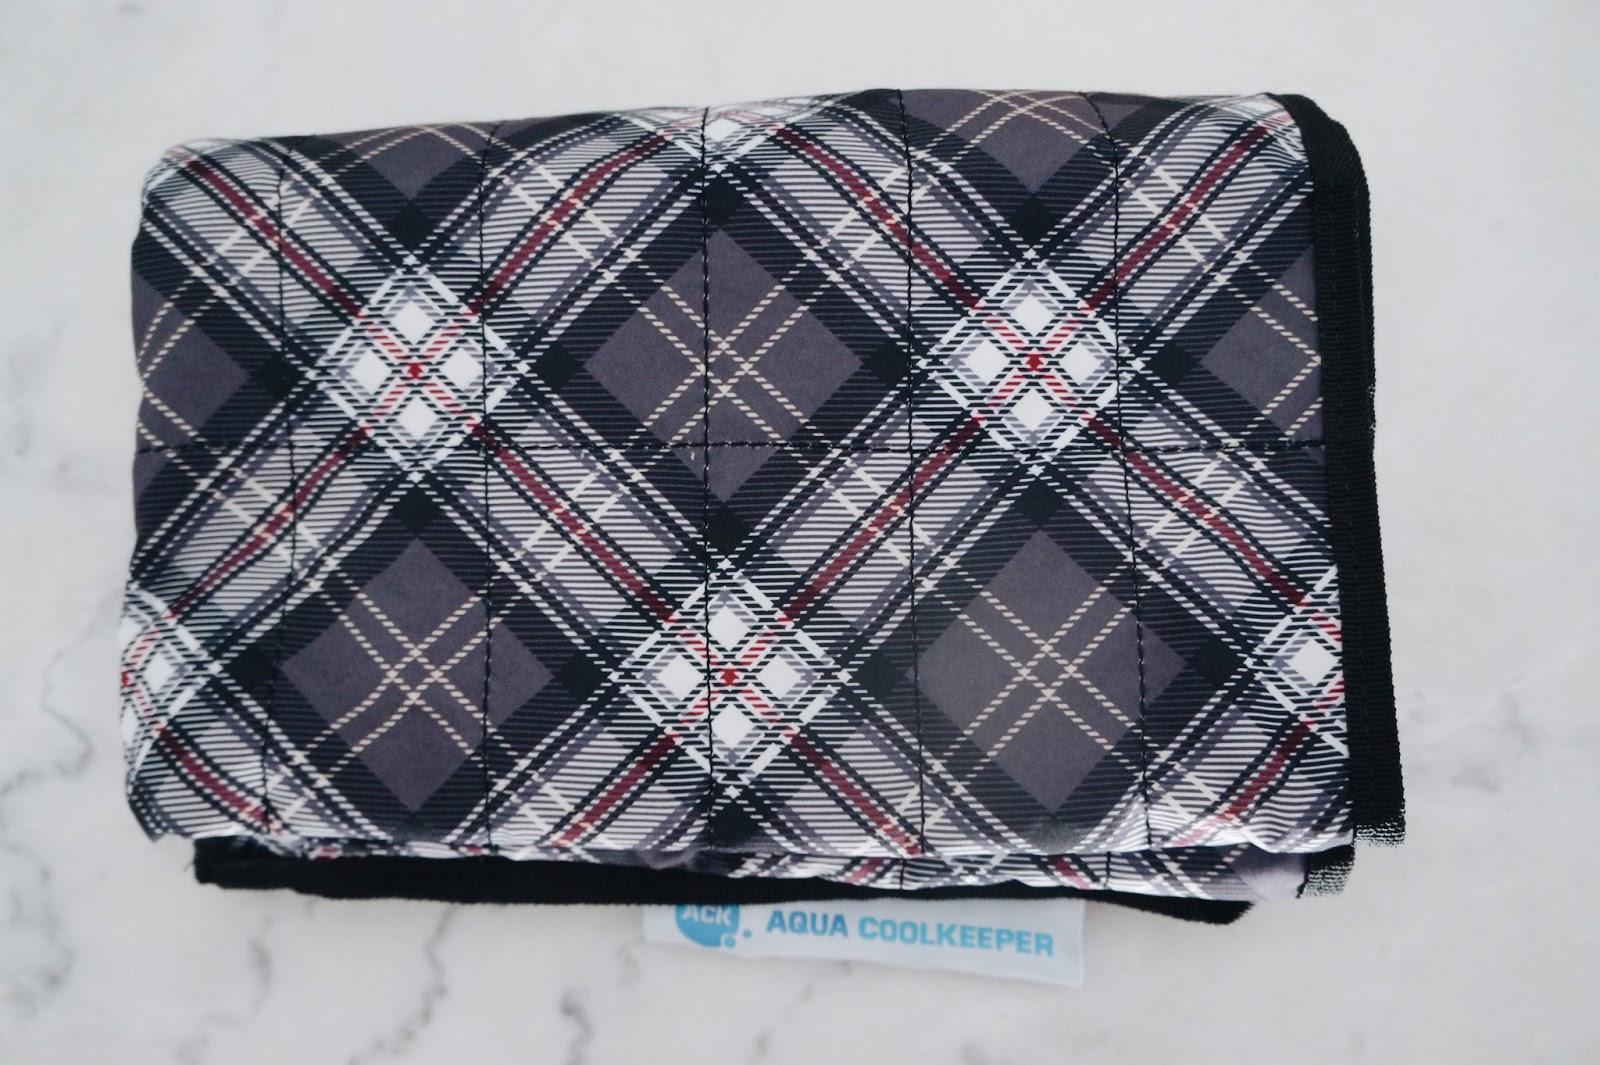 accessoires rafraichissants AquaCoolKeeper tapis bandana chien bouledogue bulldog